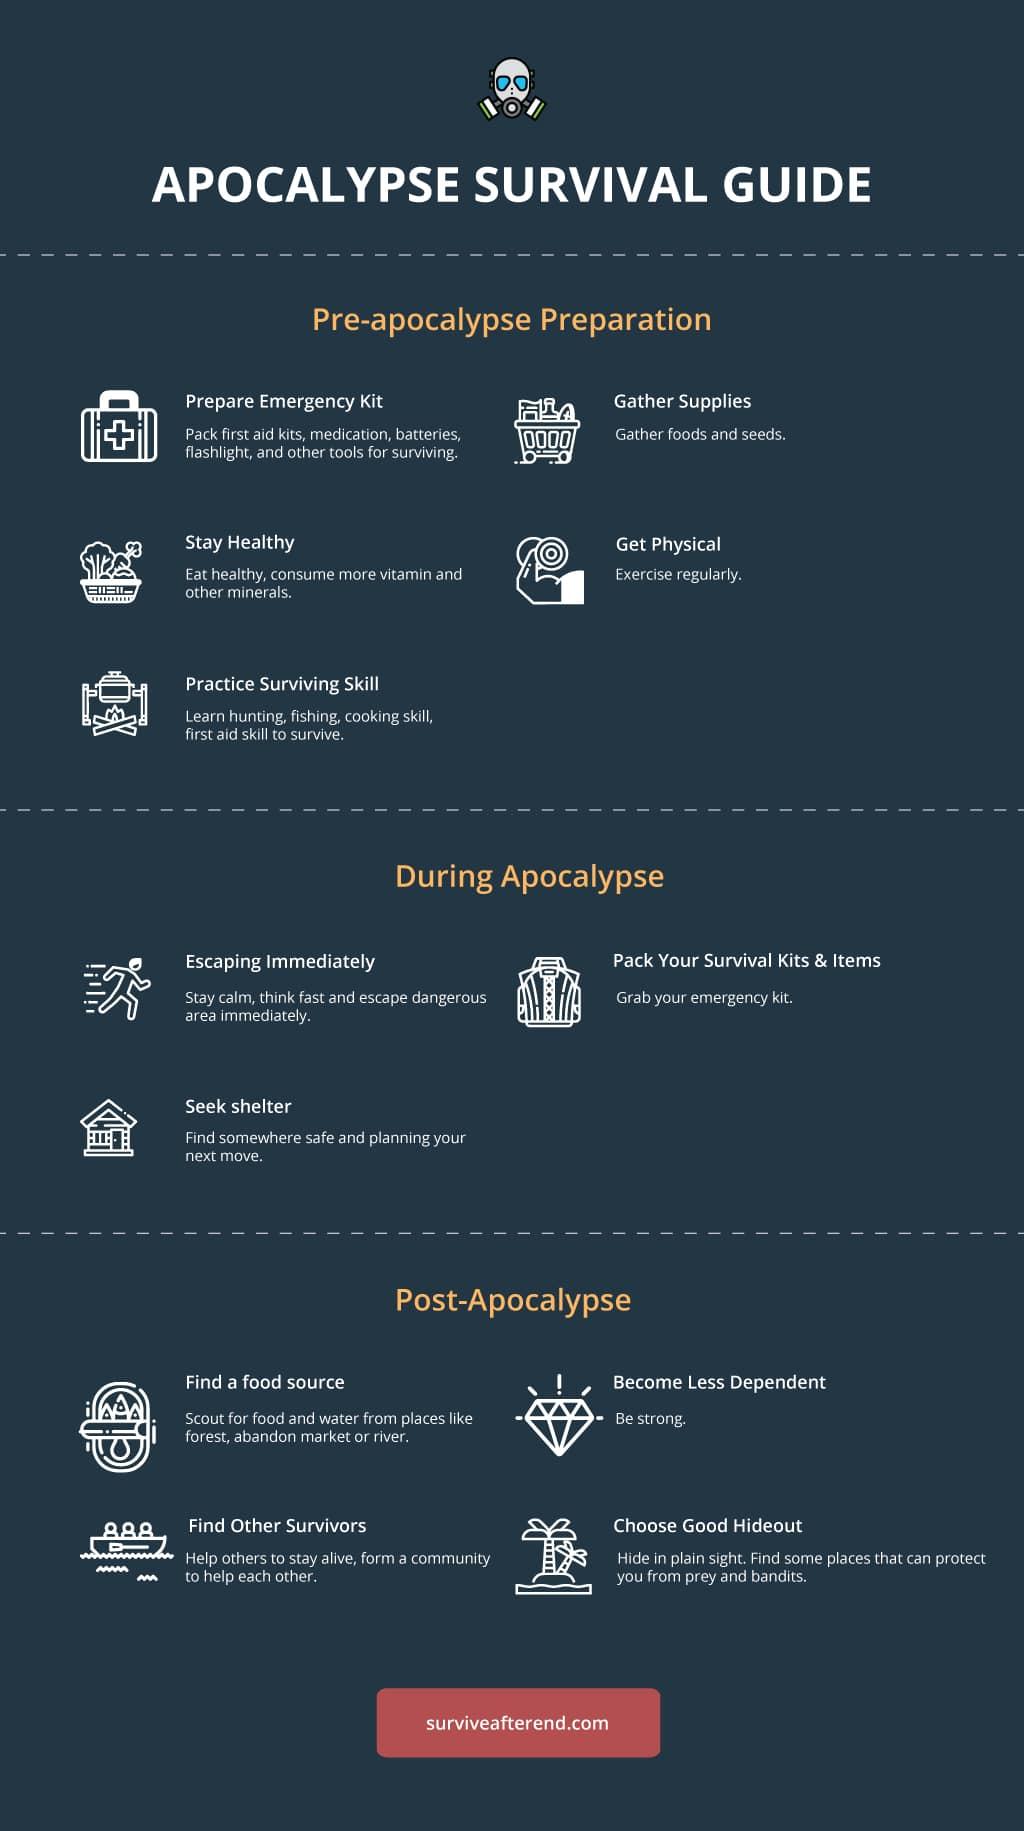 apocalypse survival guide infographic